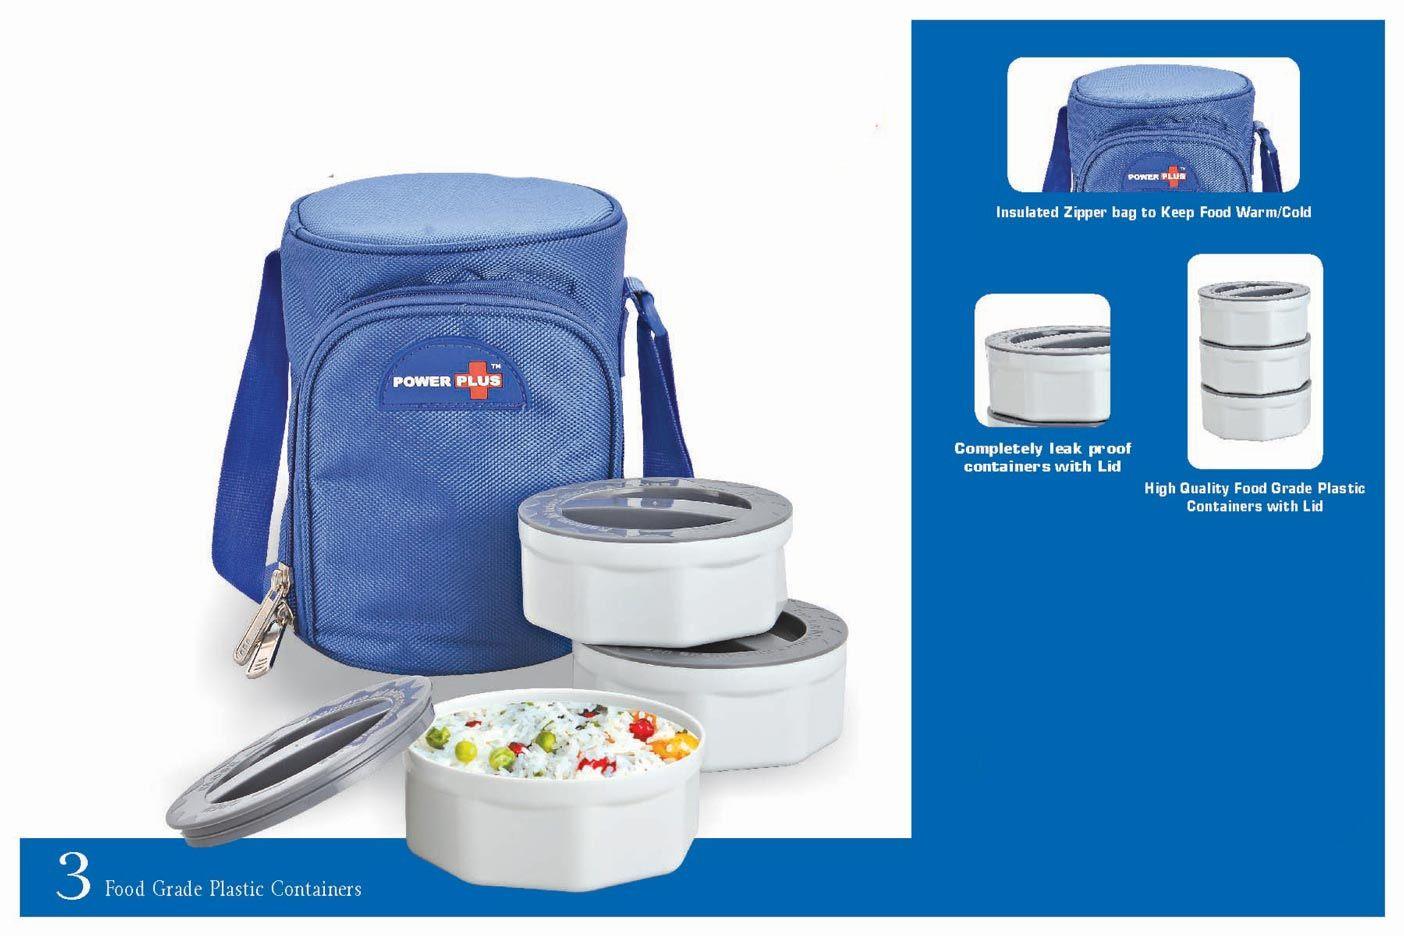 Power Plus Zippy Lunch Bag- 3 Containers (Plastic) H70 Blue